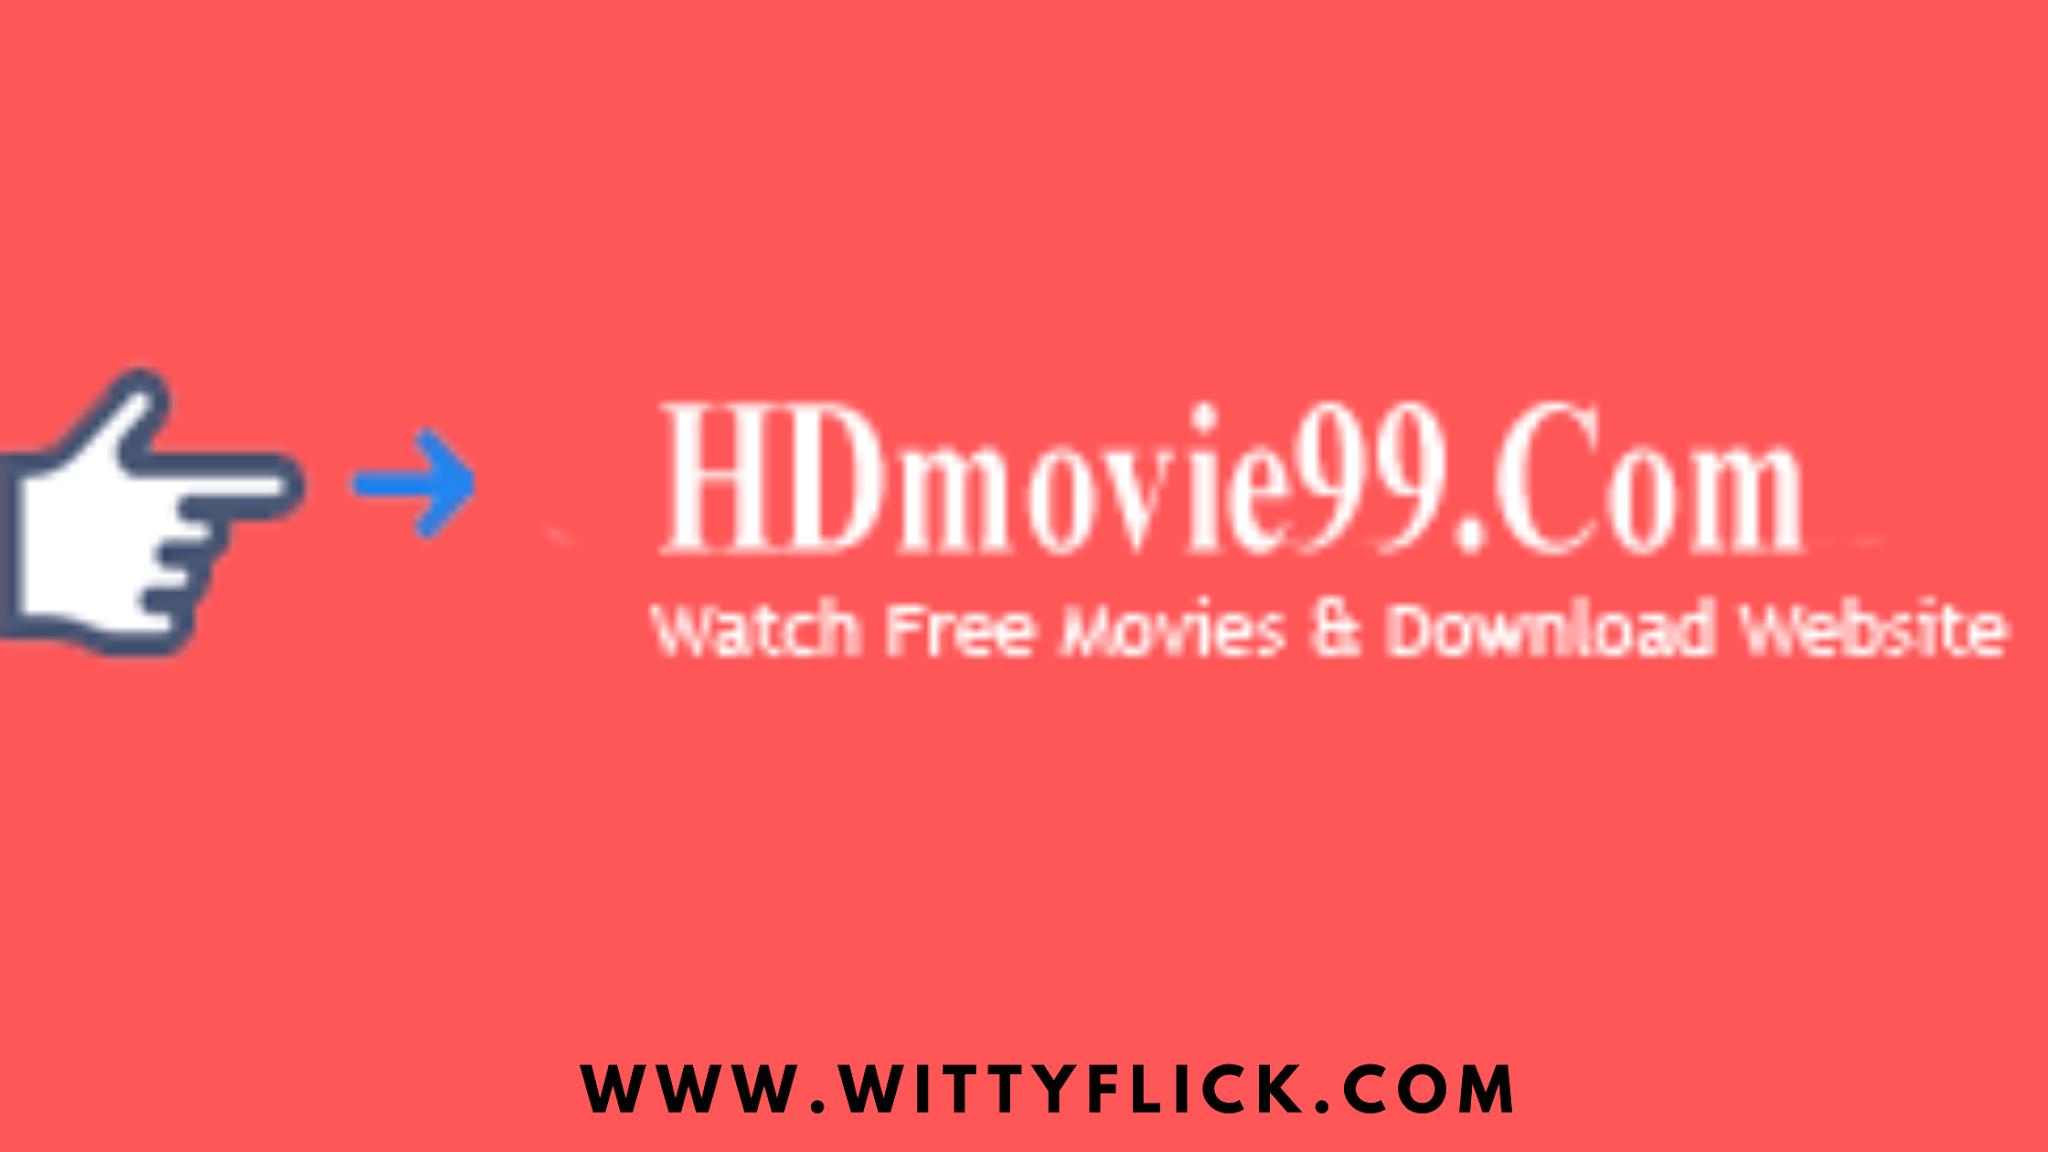 Hdmovie99 2021 - Hdmovie99 Illegal Download HD Hot Web Series Website, 18+ Webseries, News About Hdmovie99